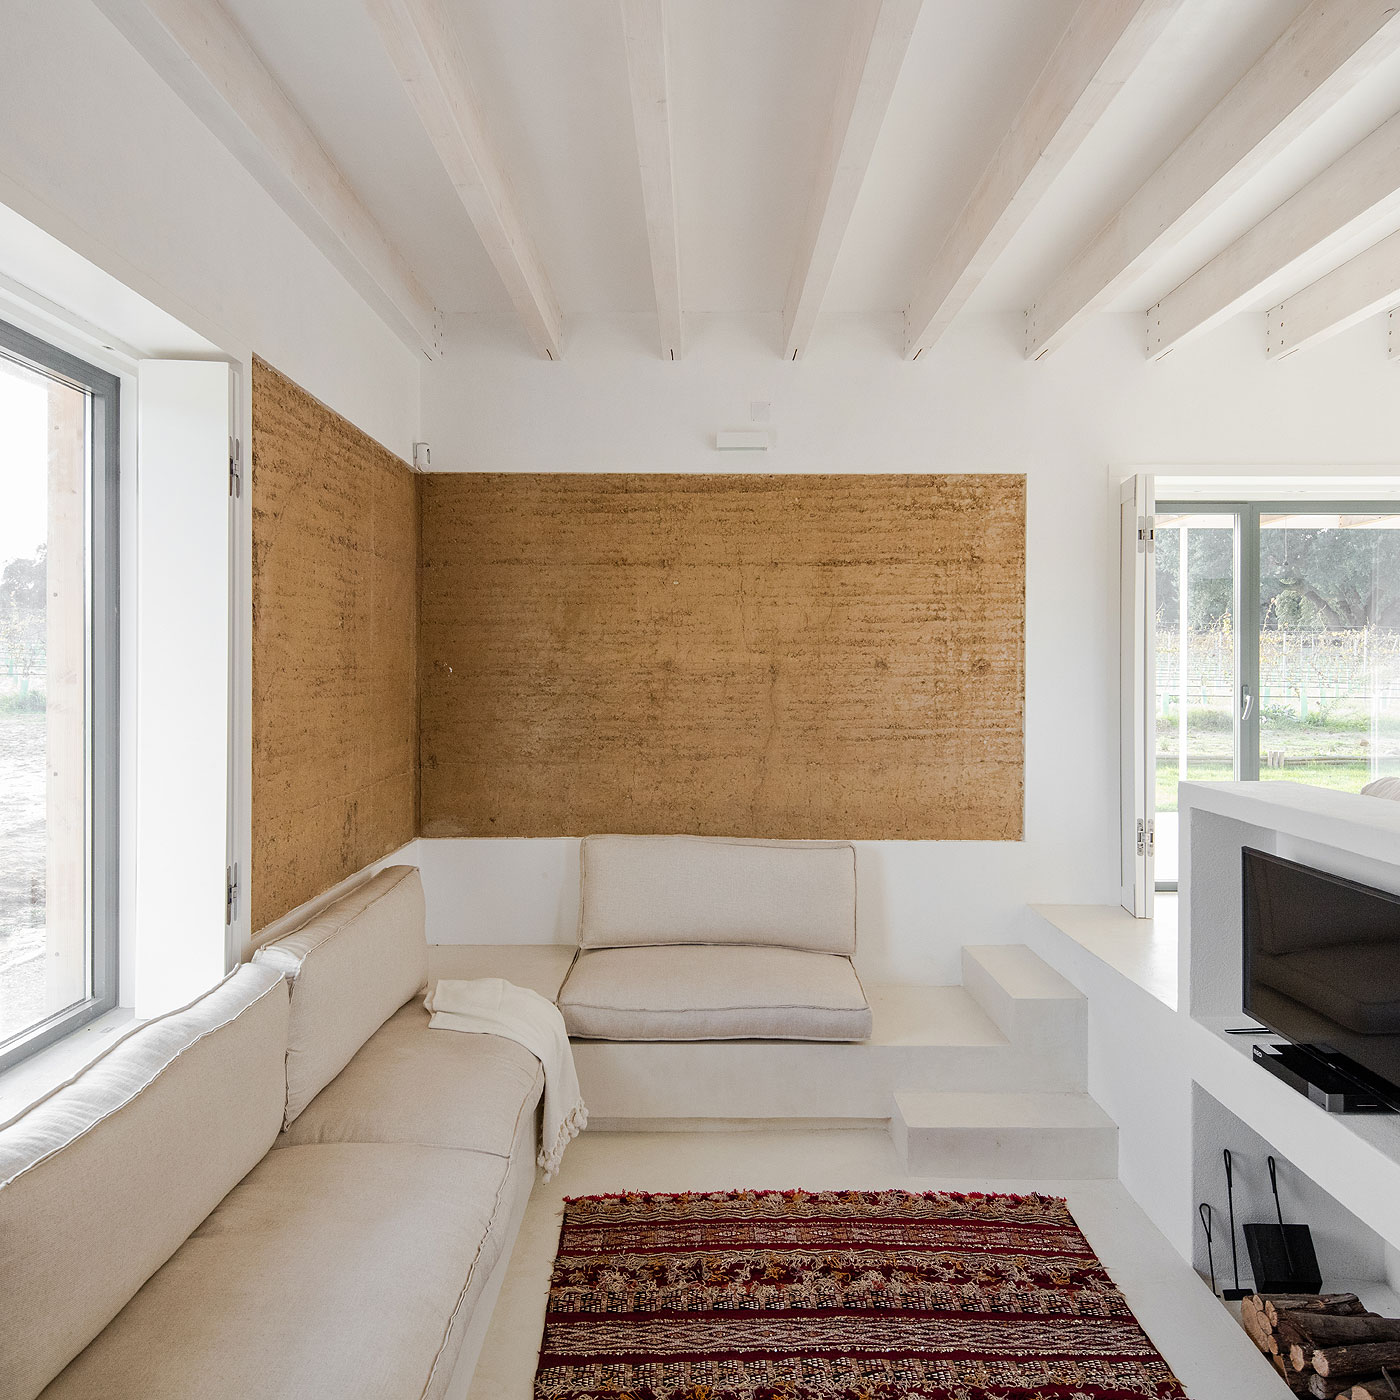 casa-vinha-estudio-blaanc (6)